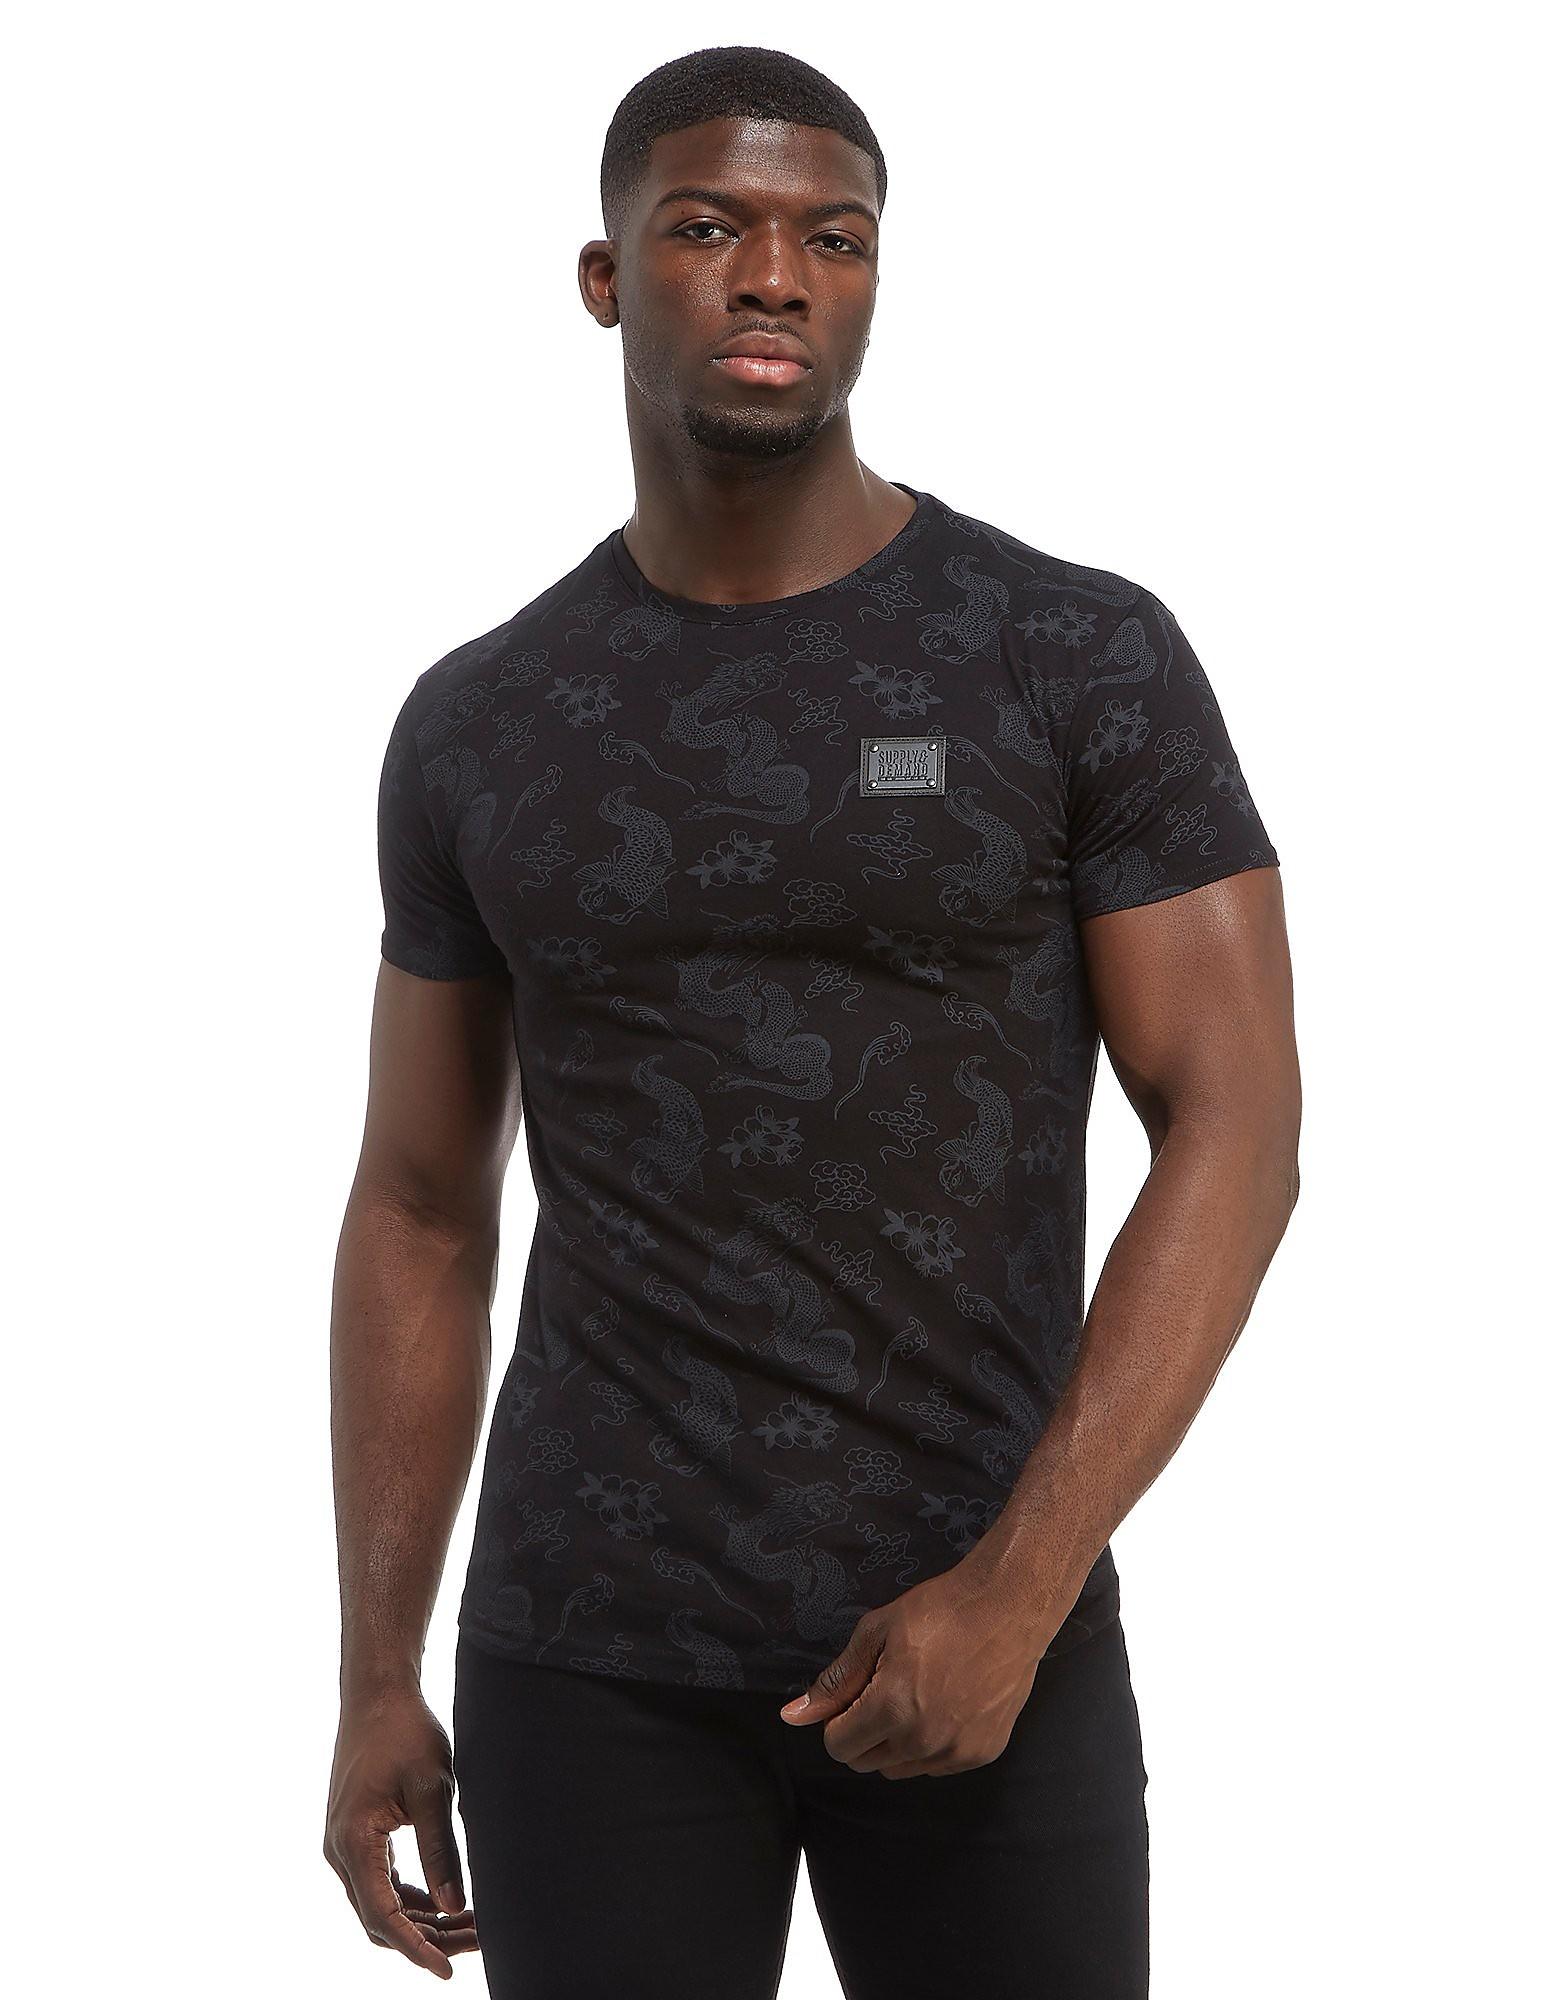 Supply & Demand Dragon T-Shirt - Only at JD, Black